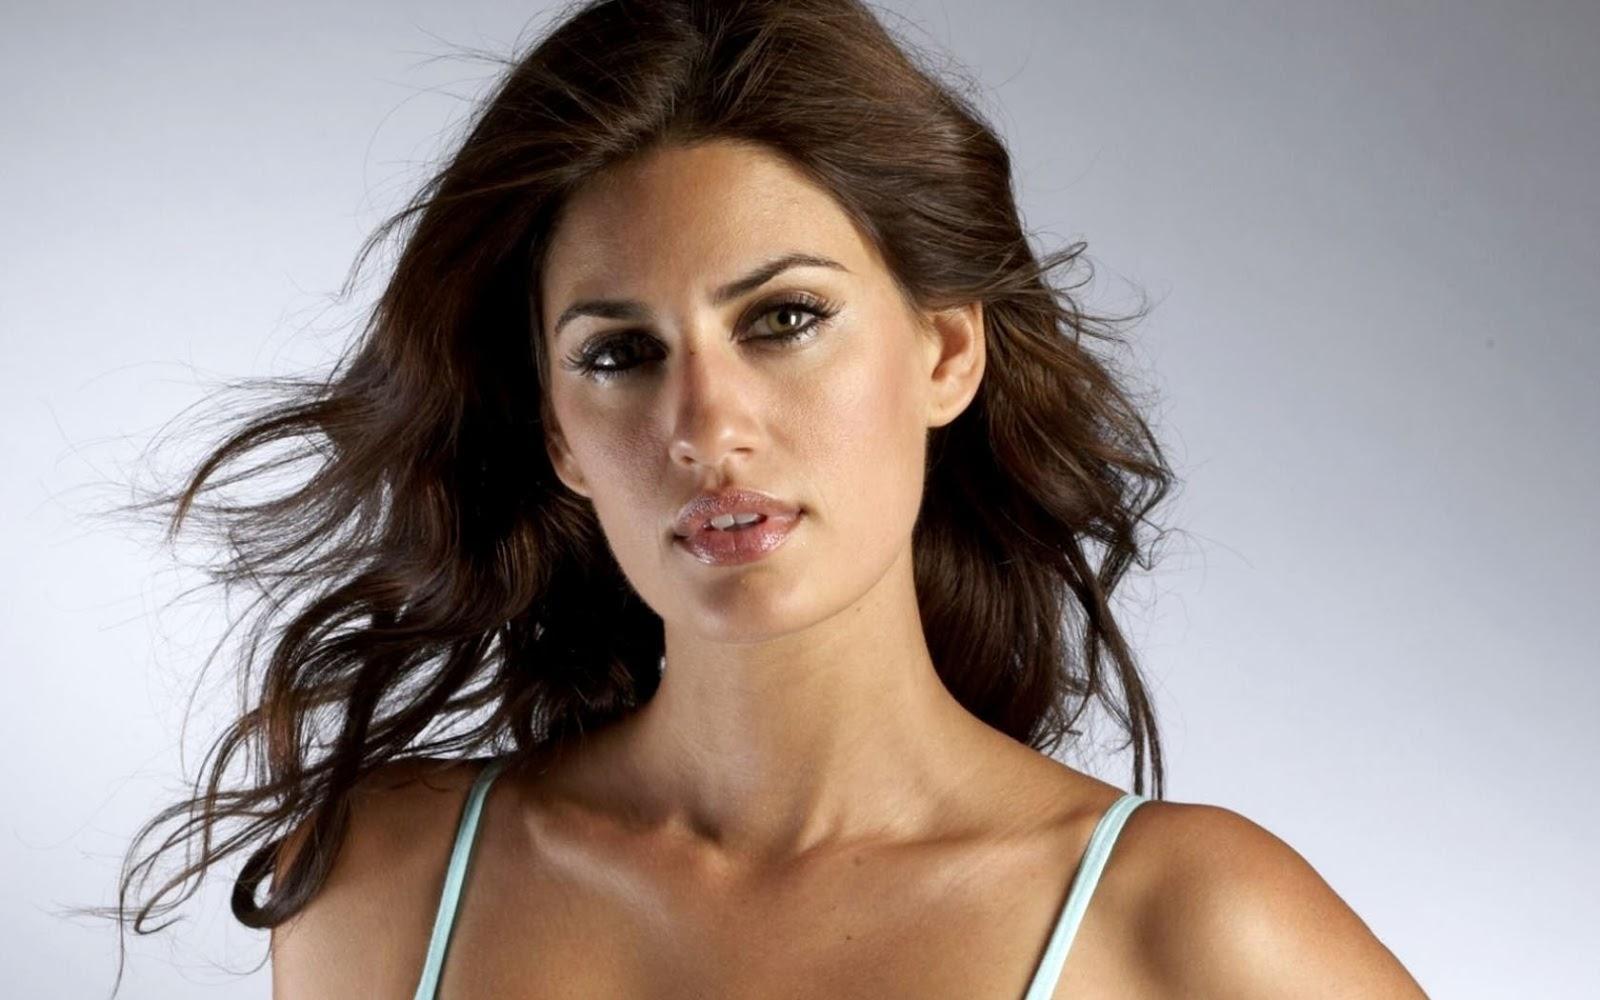 10 Wanita Tercantik Di Timur Tengah Yang Sangat Mempesona Dunia